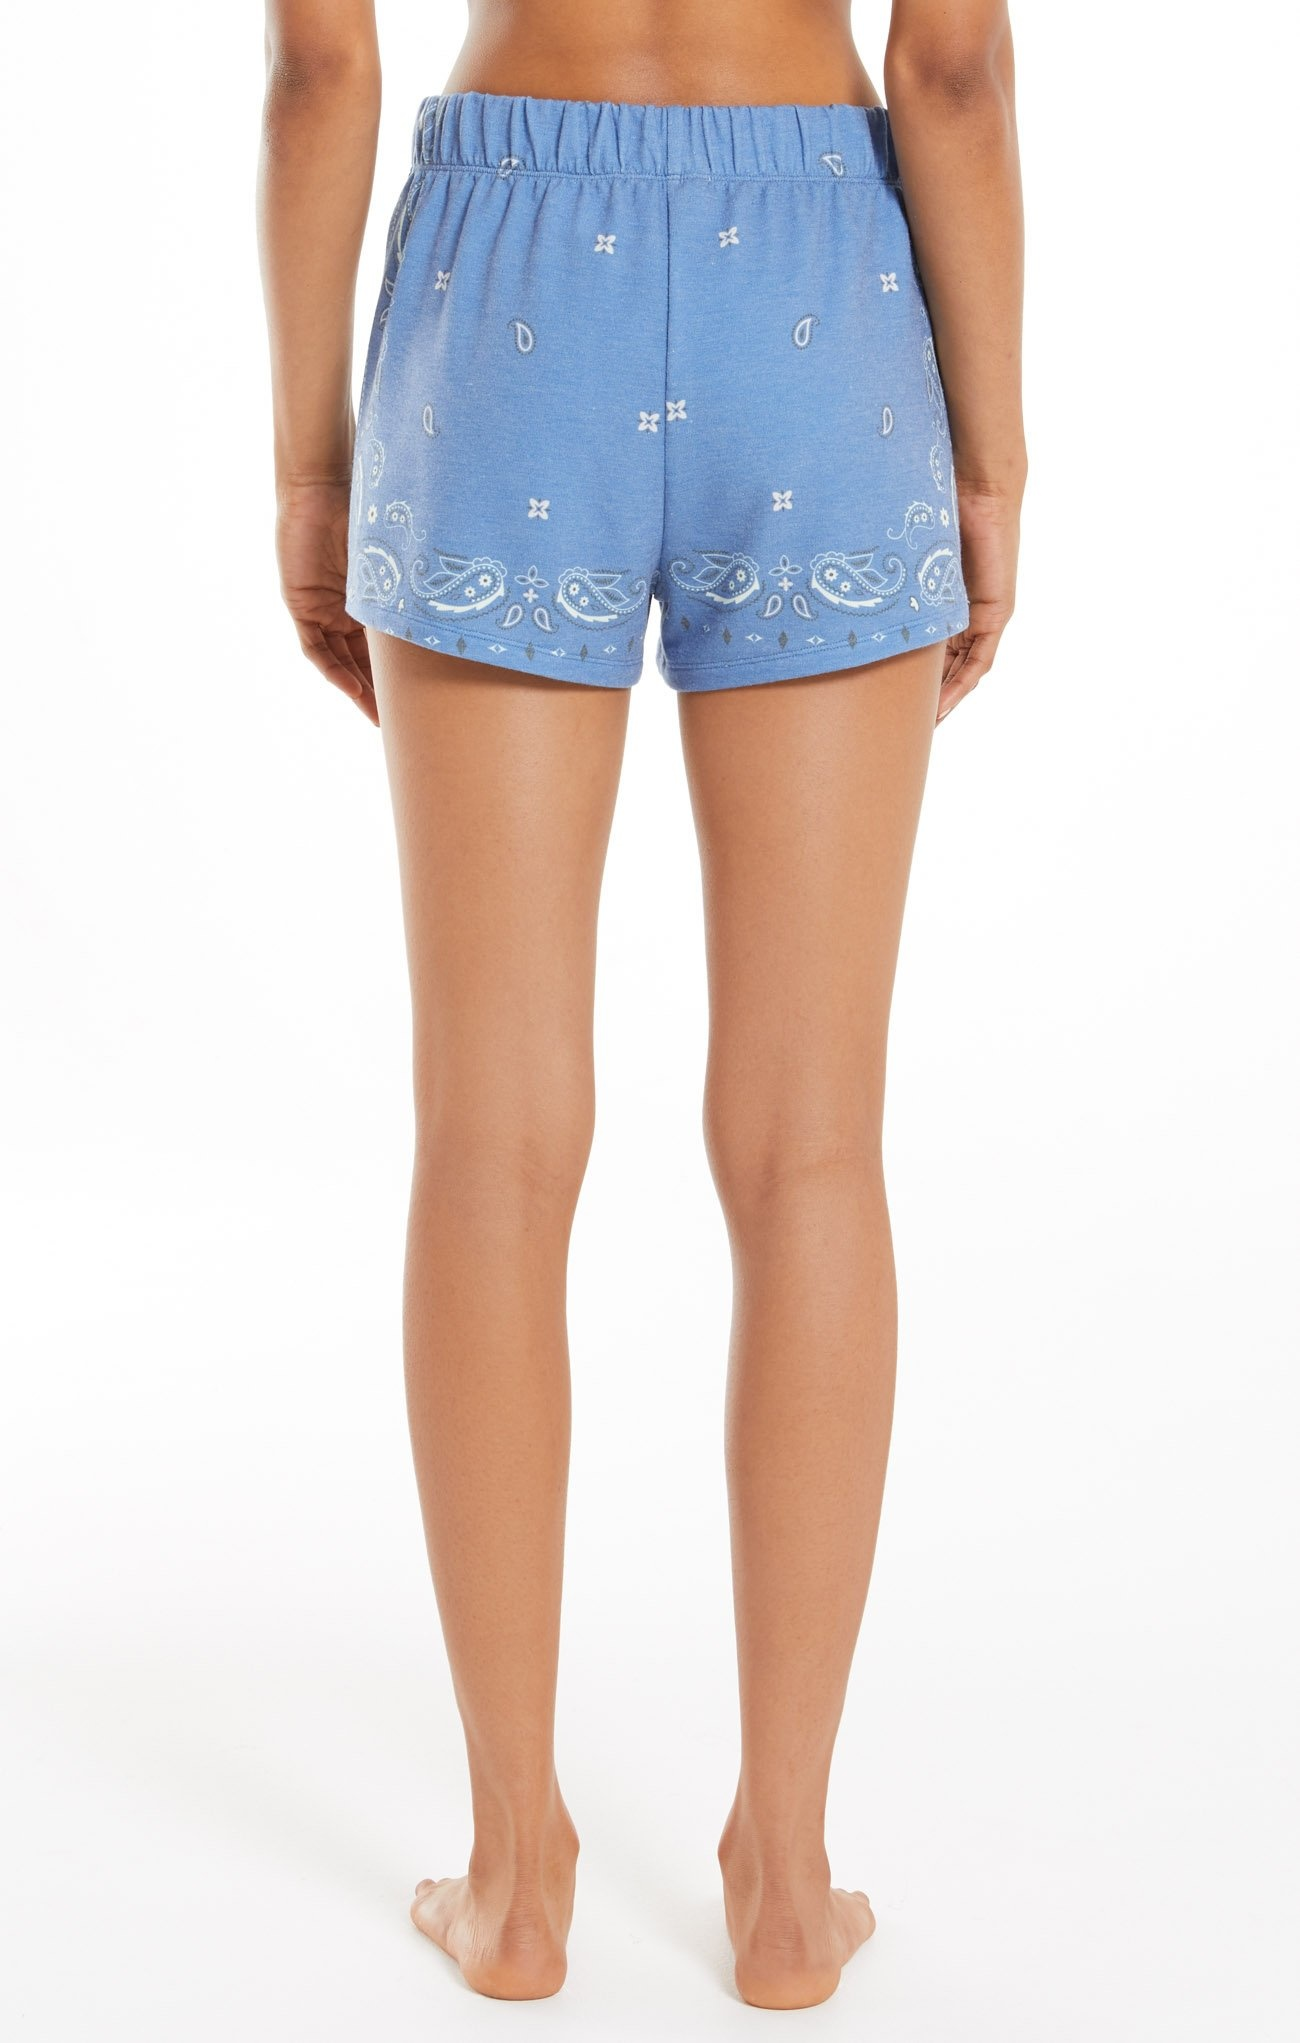 Carolina Bandana Shorts